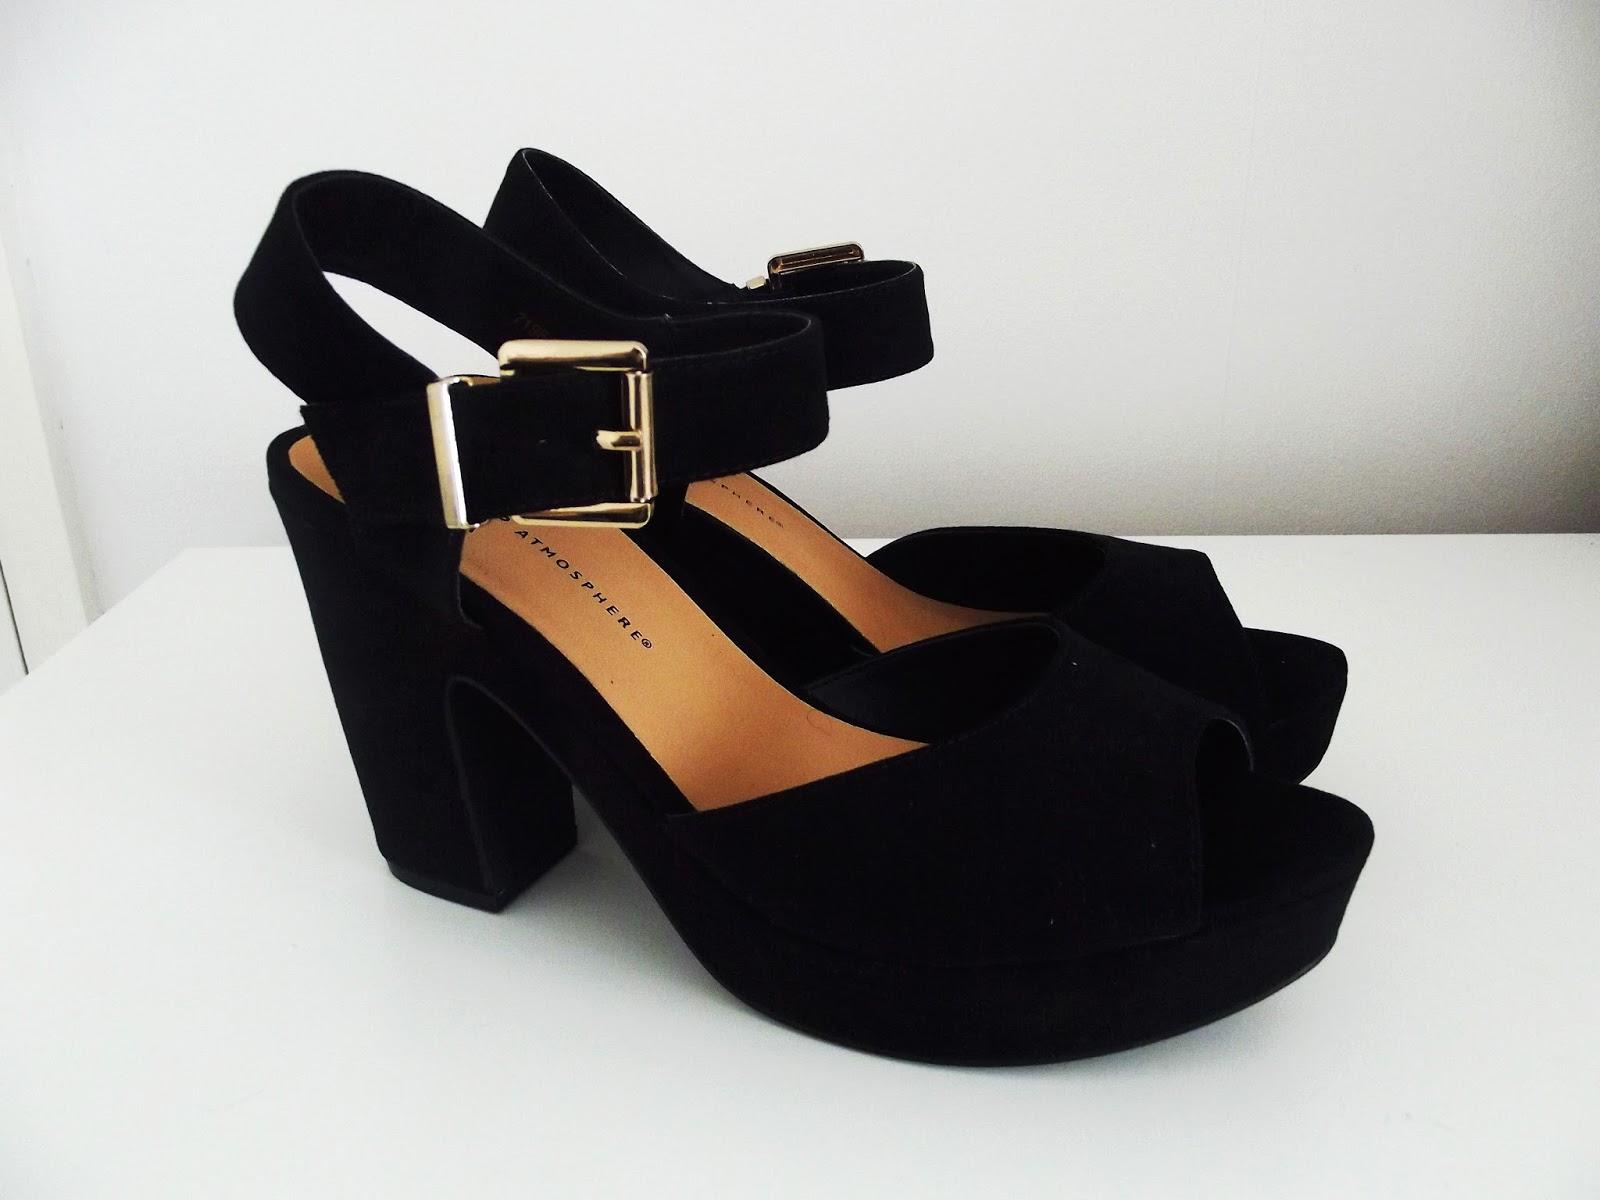 Black sandals primark - Chunky Heel Black Shoes